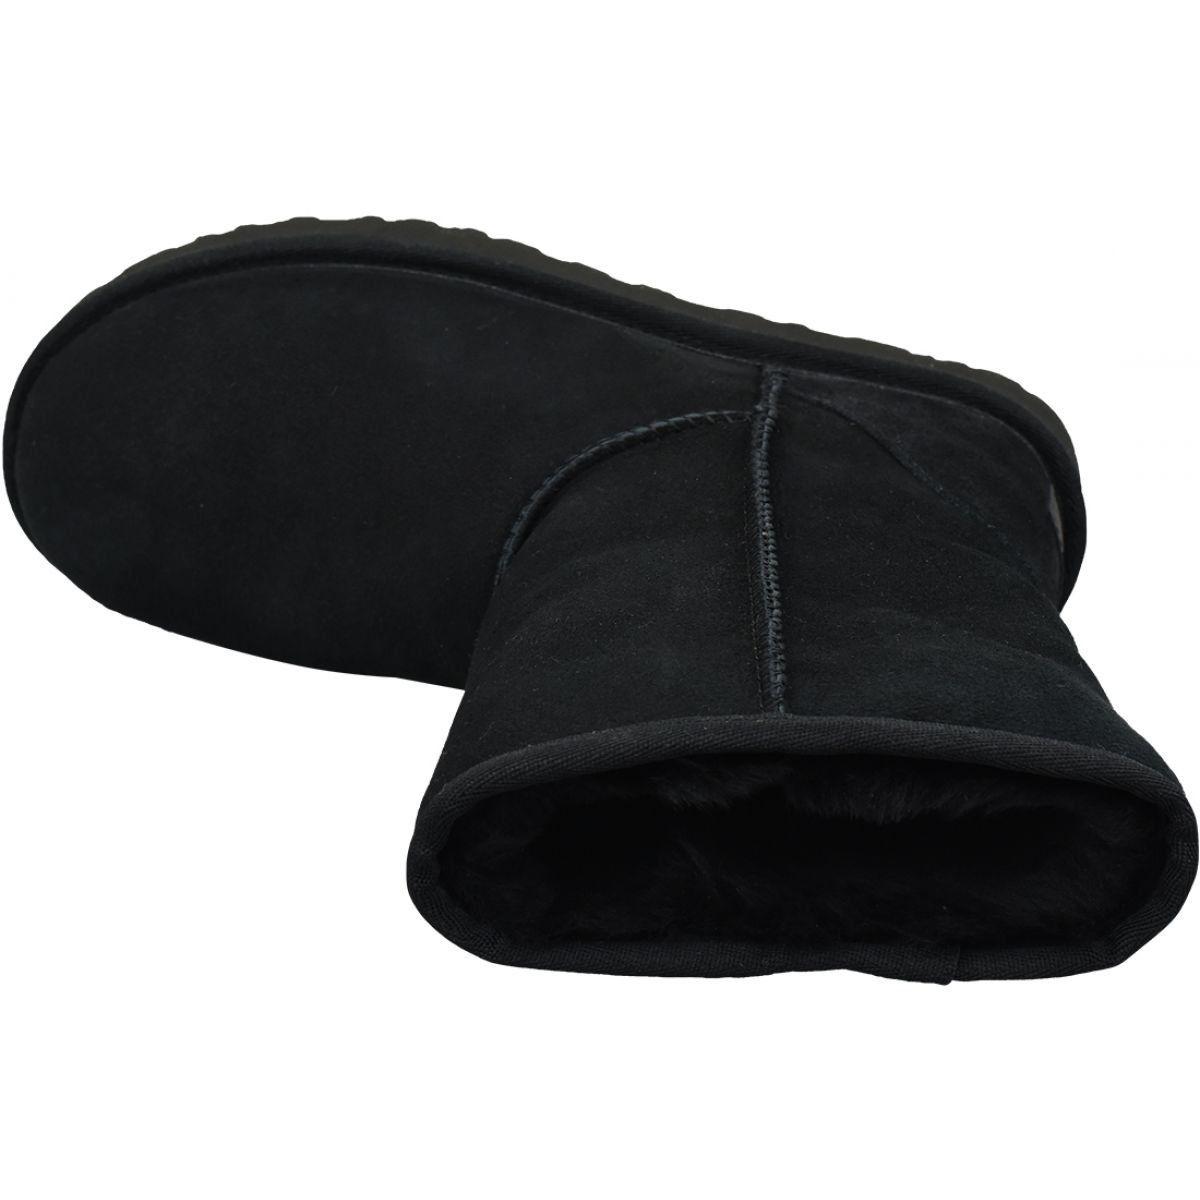 Buty Ugg Classic Short Ii W 1016223 Blk Czarne Ugg Classic Ugg Classic Short Shoes